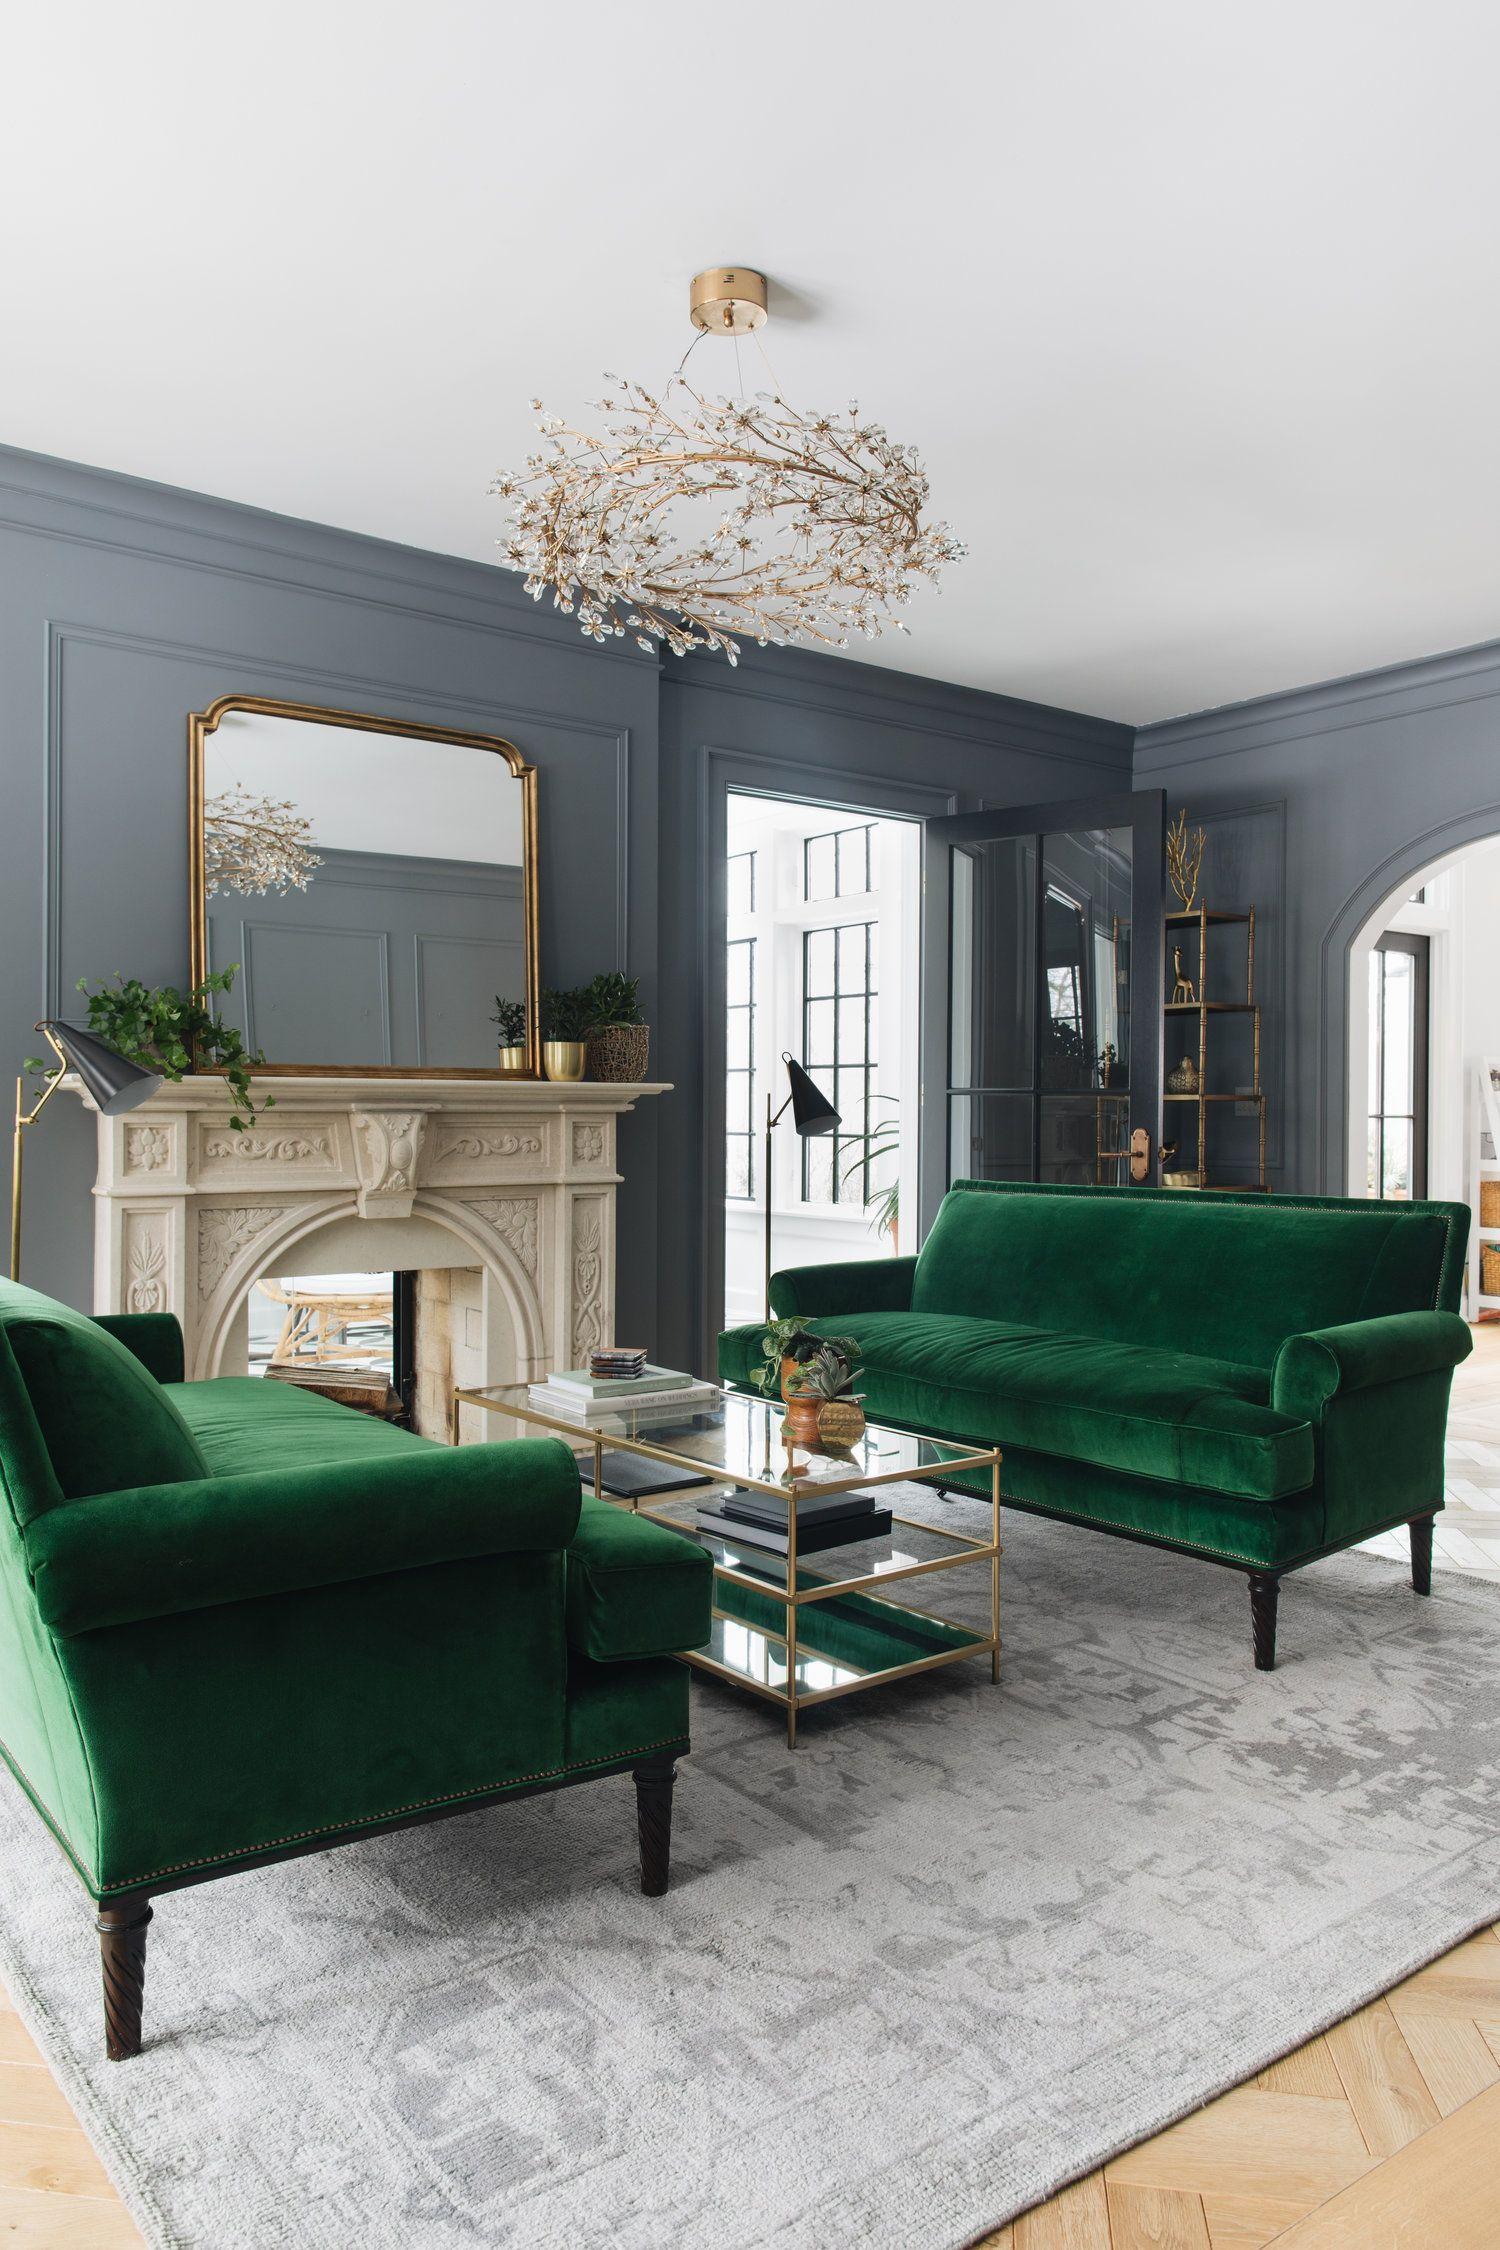 Transitional Living Rooms Green Interior Design Living Room Paint Transitional living room paint